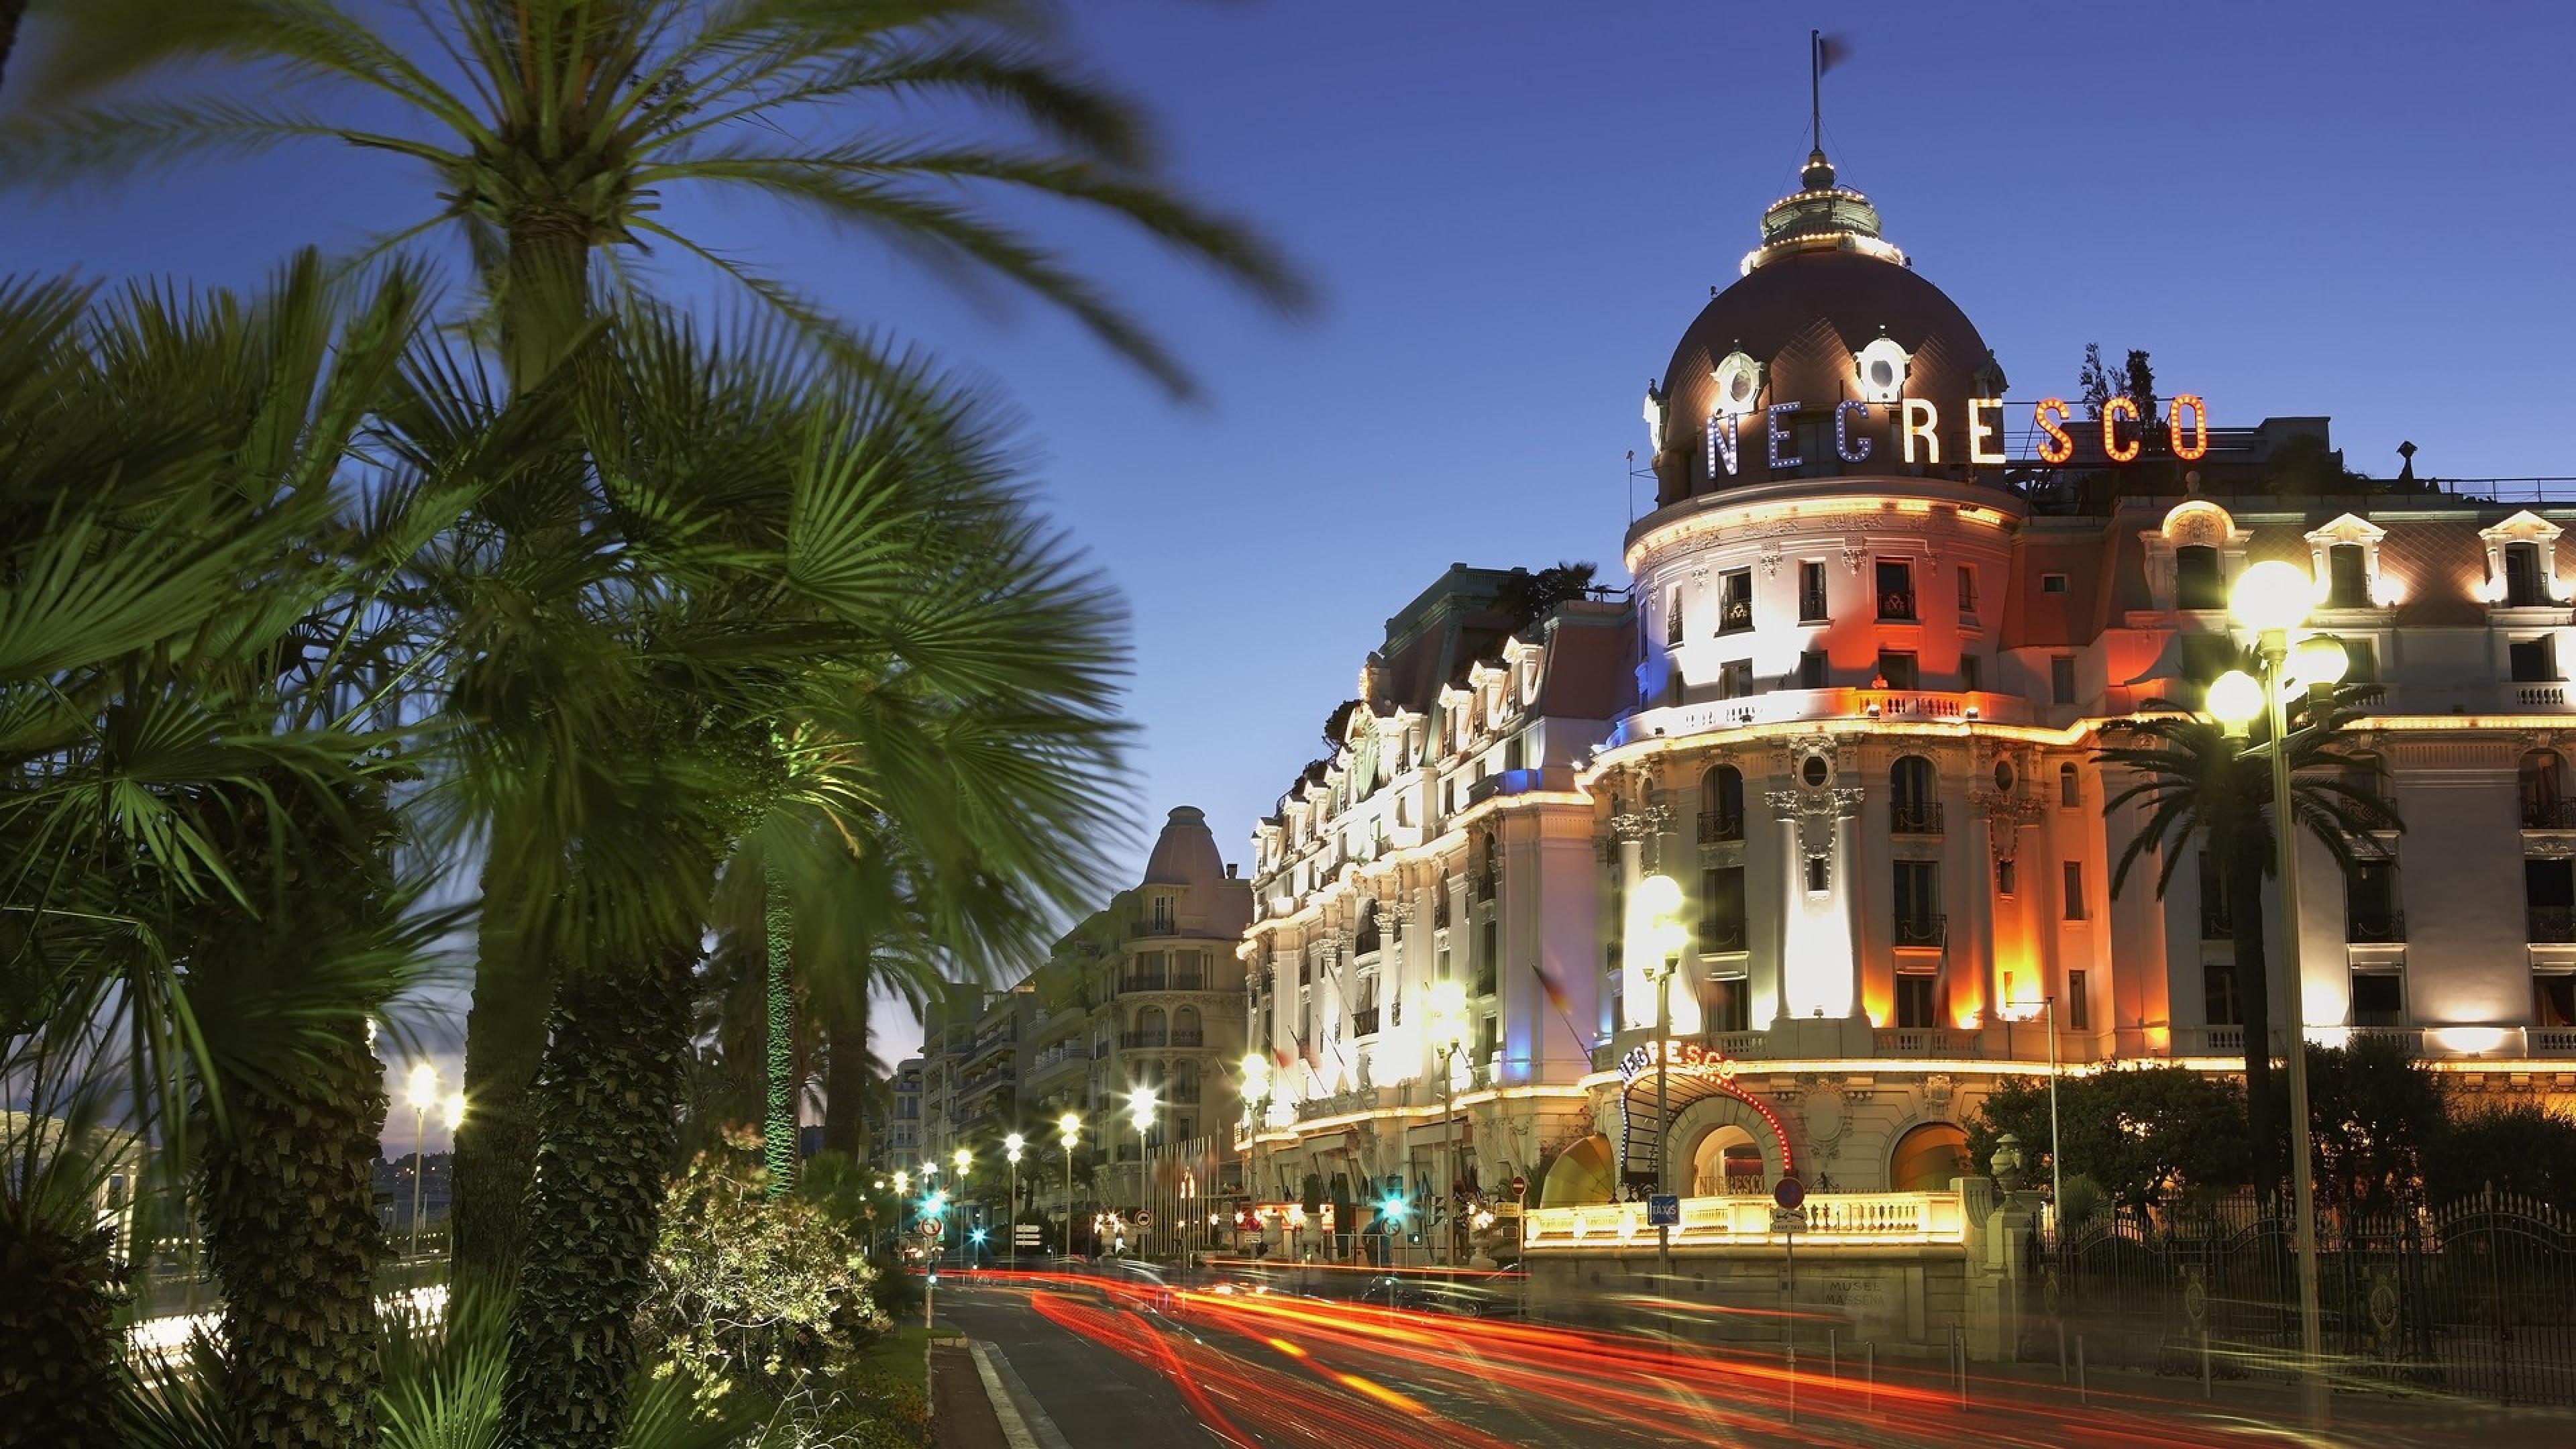 Ницца, Франция. Отдых